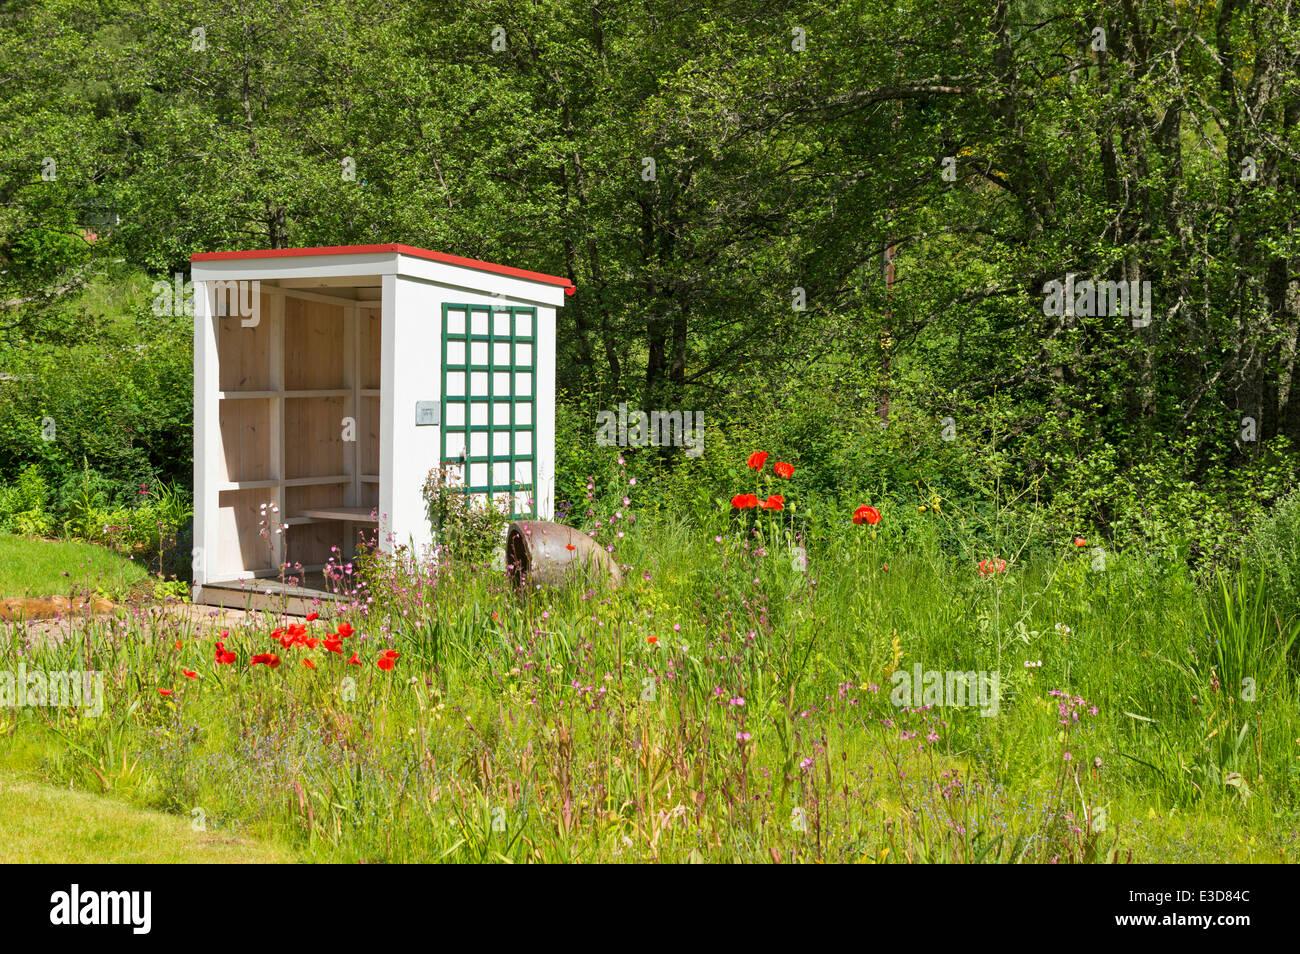 SUMMER HOUSE AND GARDEN AT THE KNOCKANDO WOOL MILL MORAY SCOTLAND - Stock Image